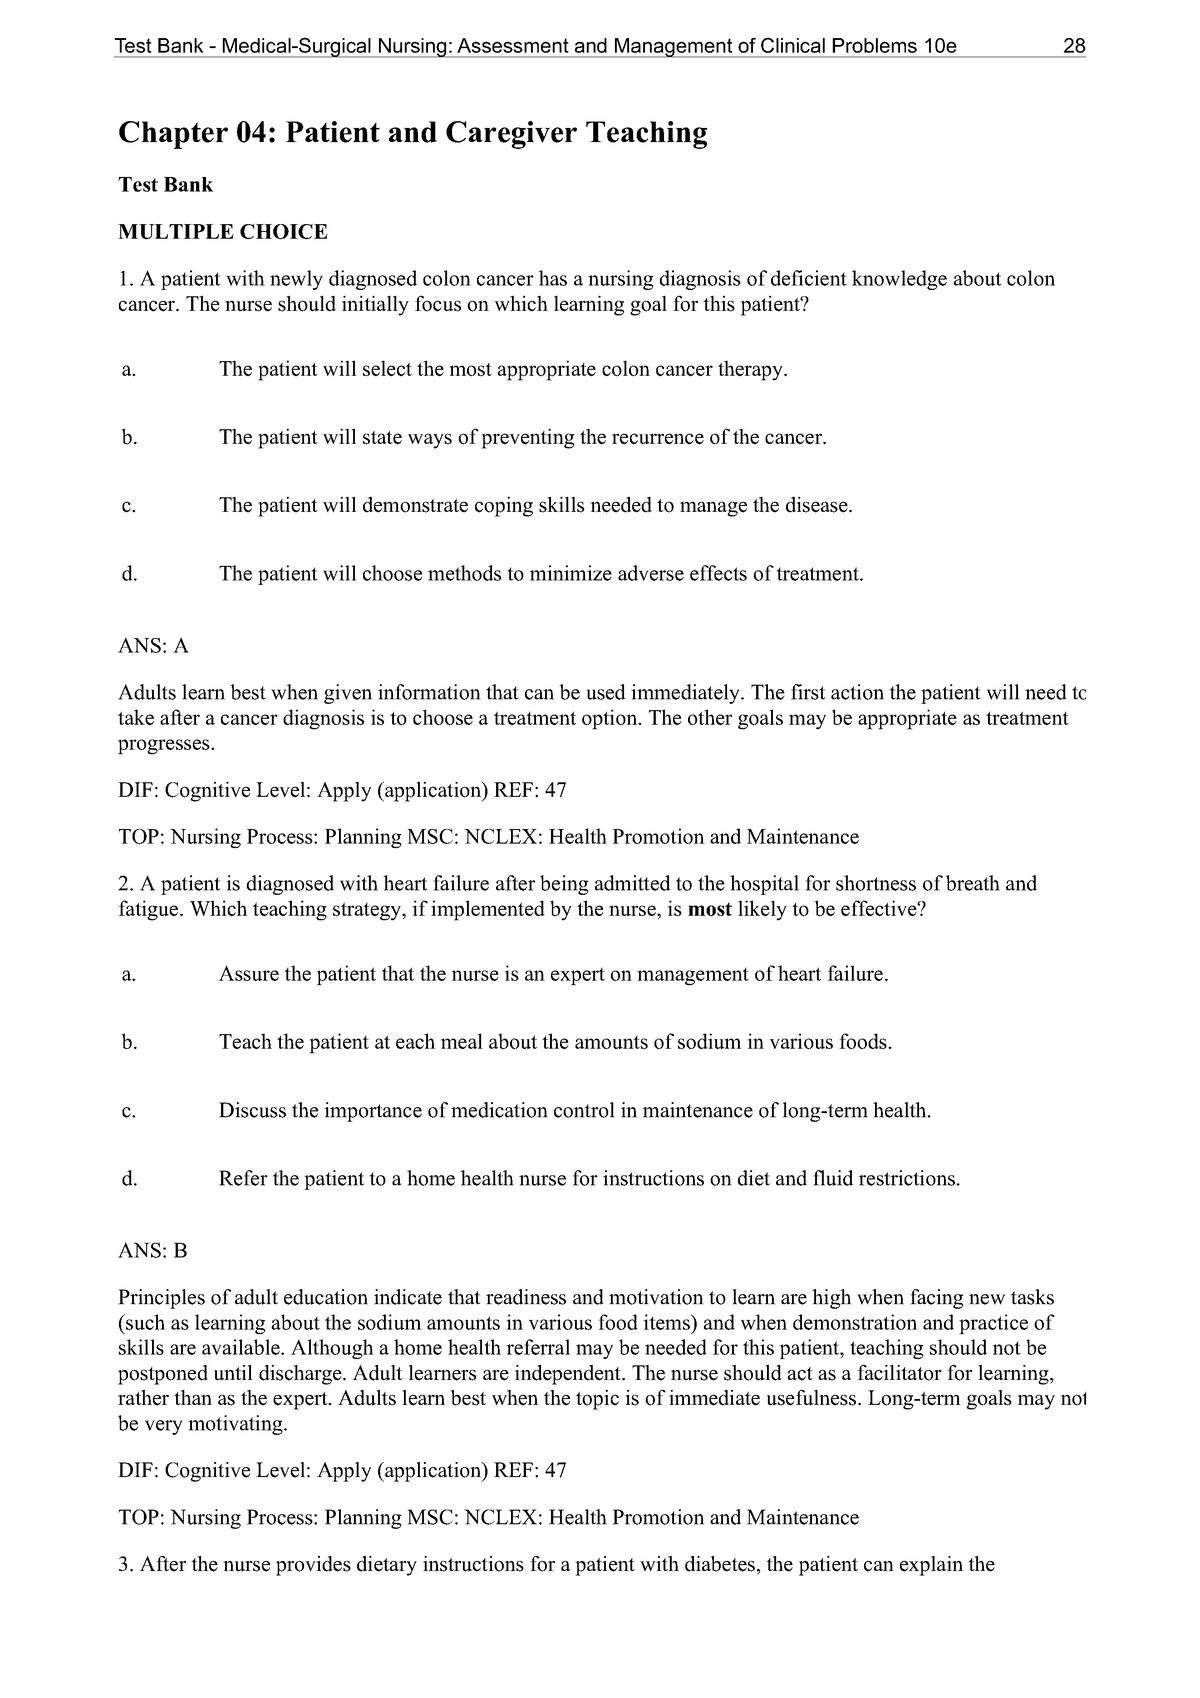 Chapter 04 Patient And Caregiver Teaching Nurs 4521 Uh Studocu